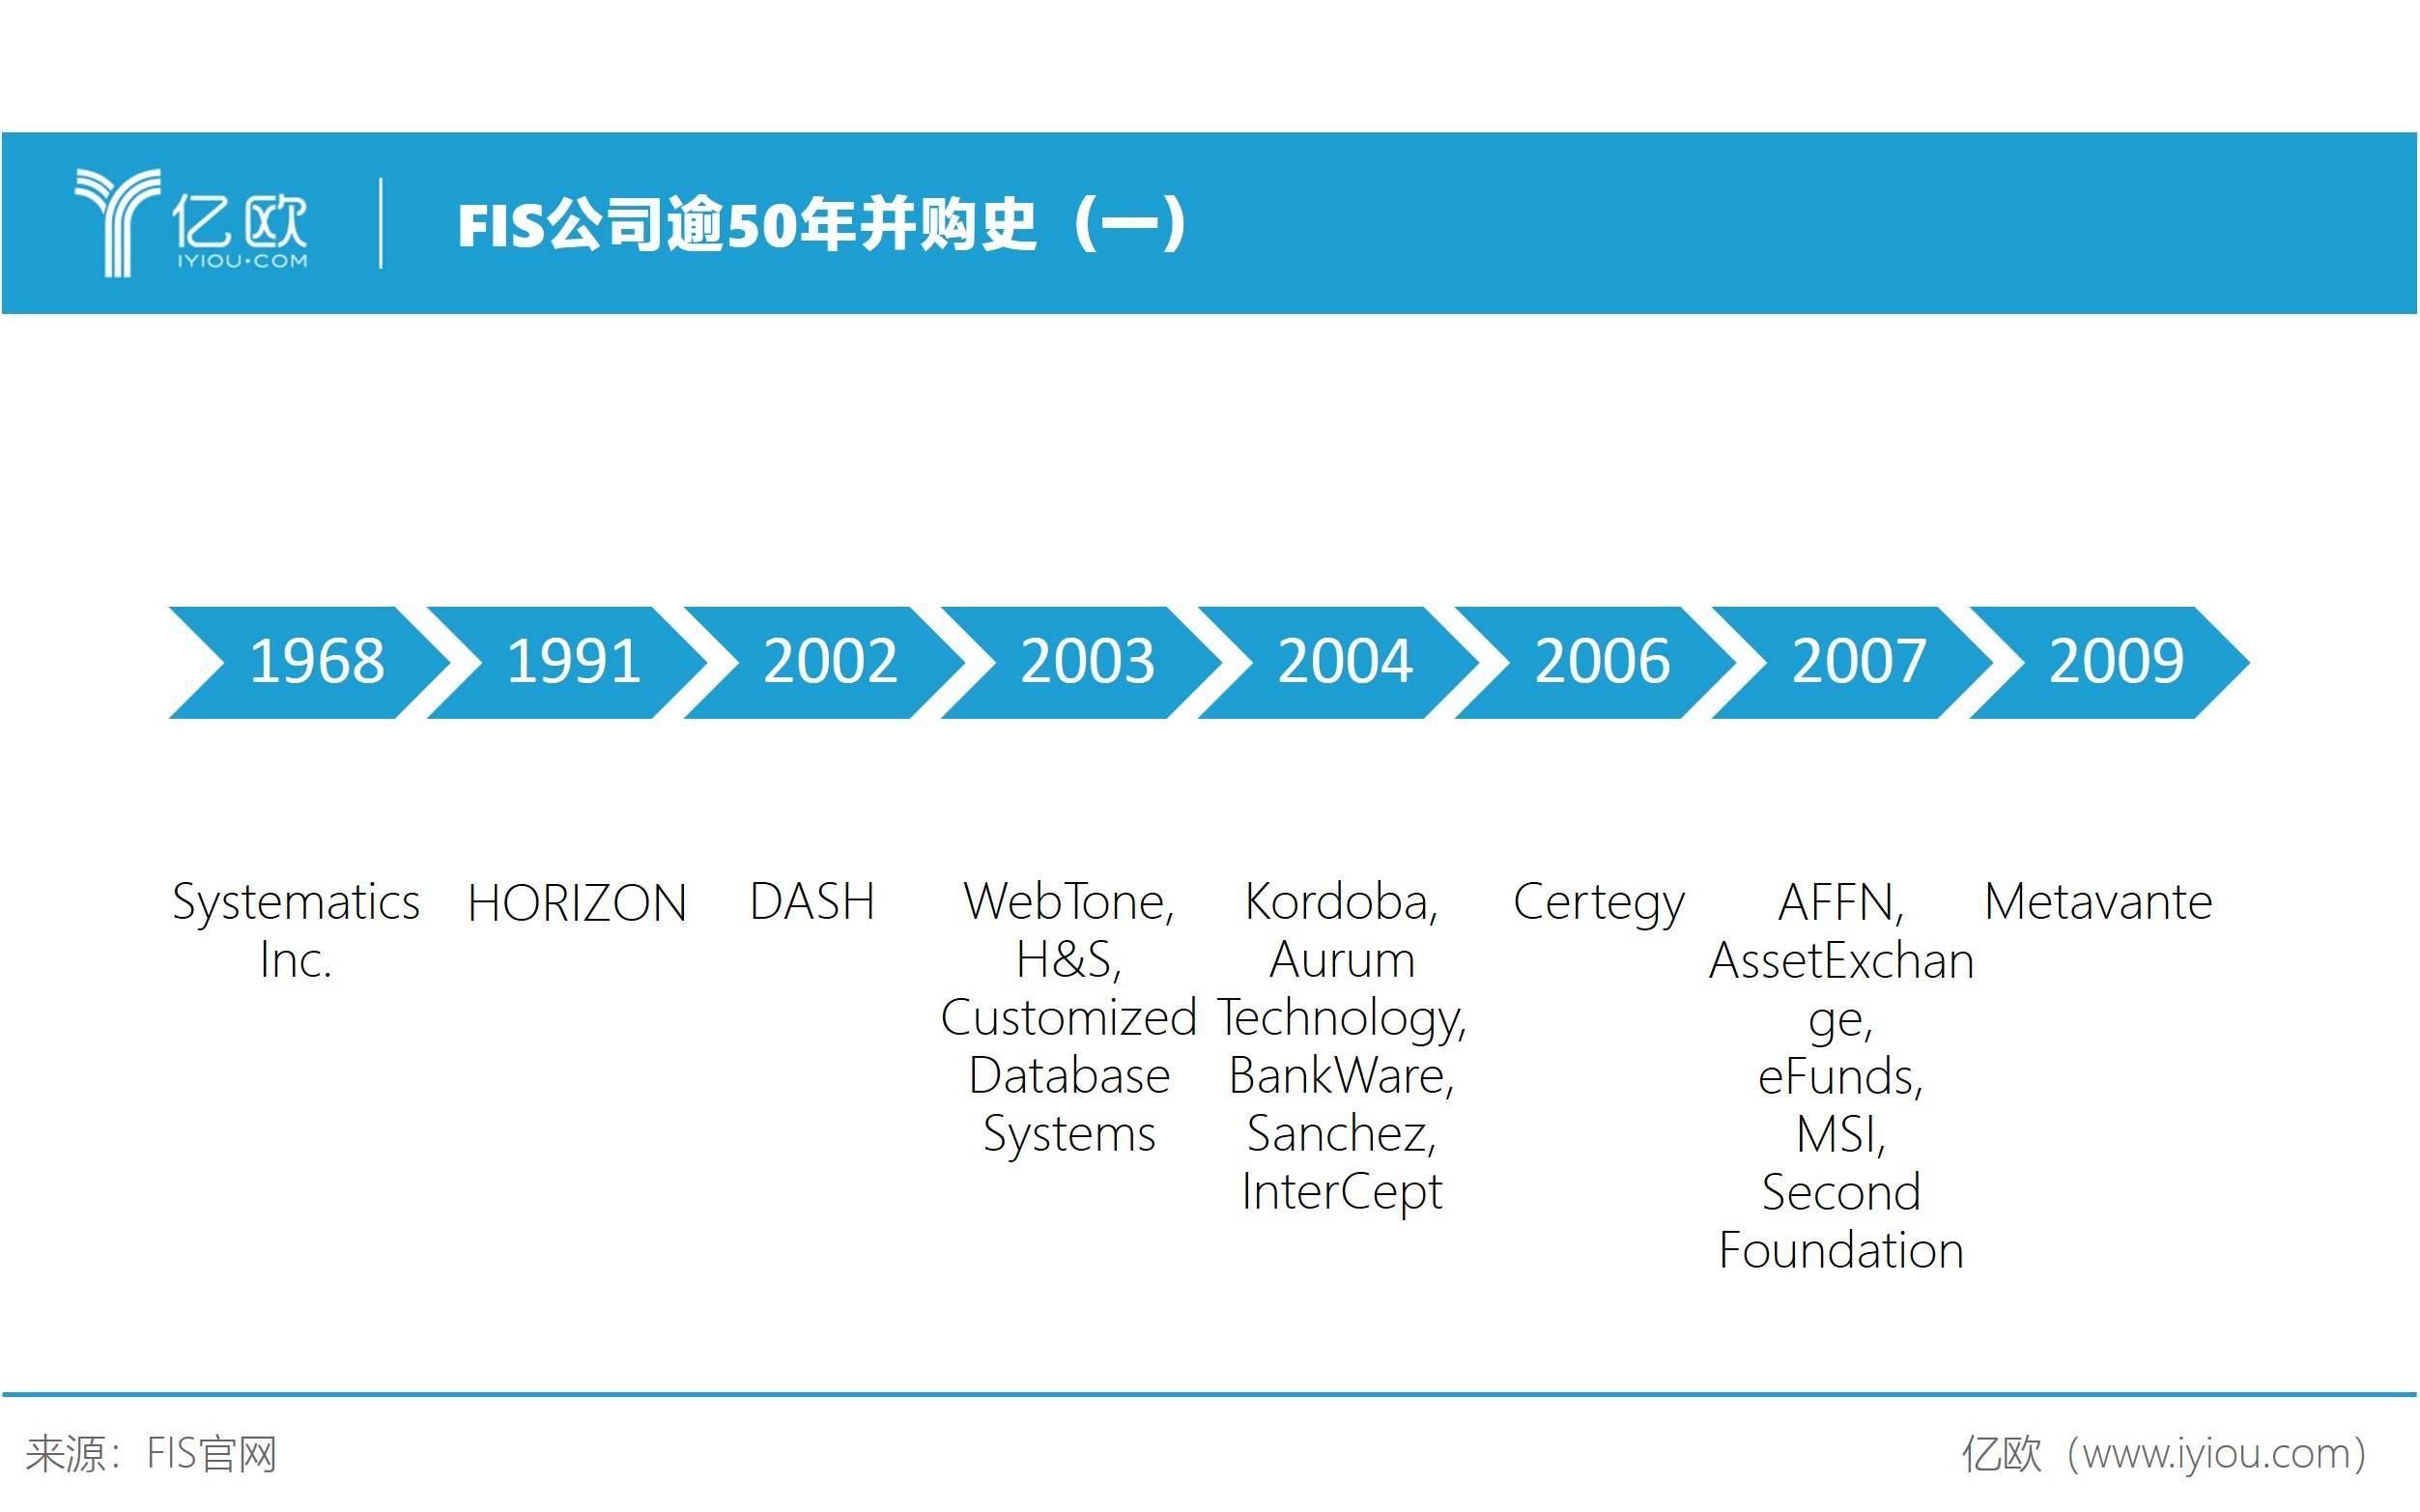 FIS公司逾50年并购史(一)